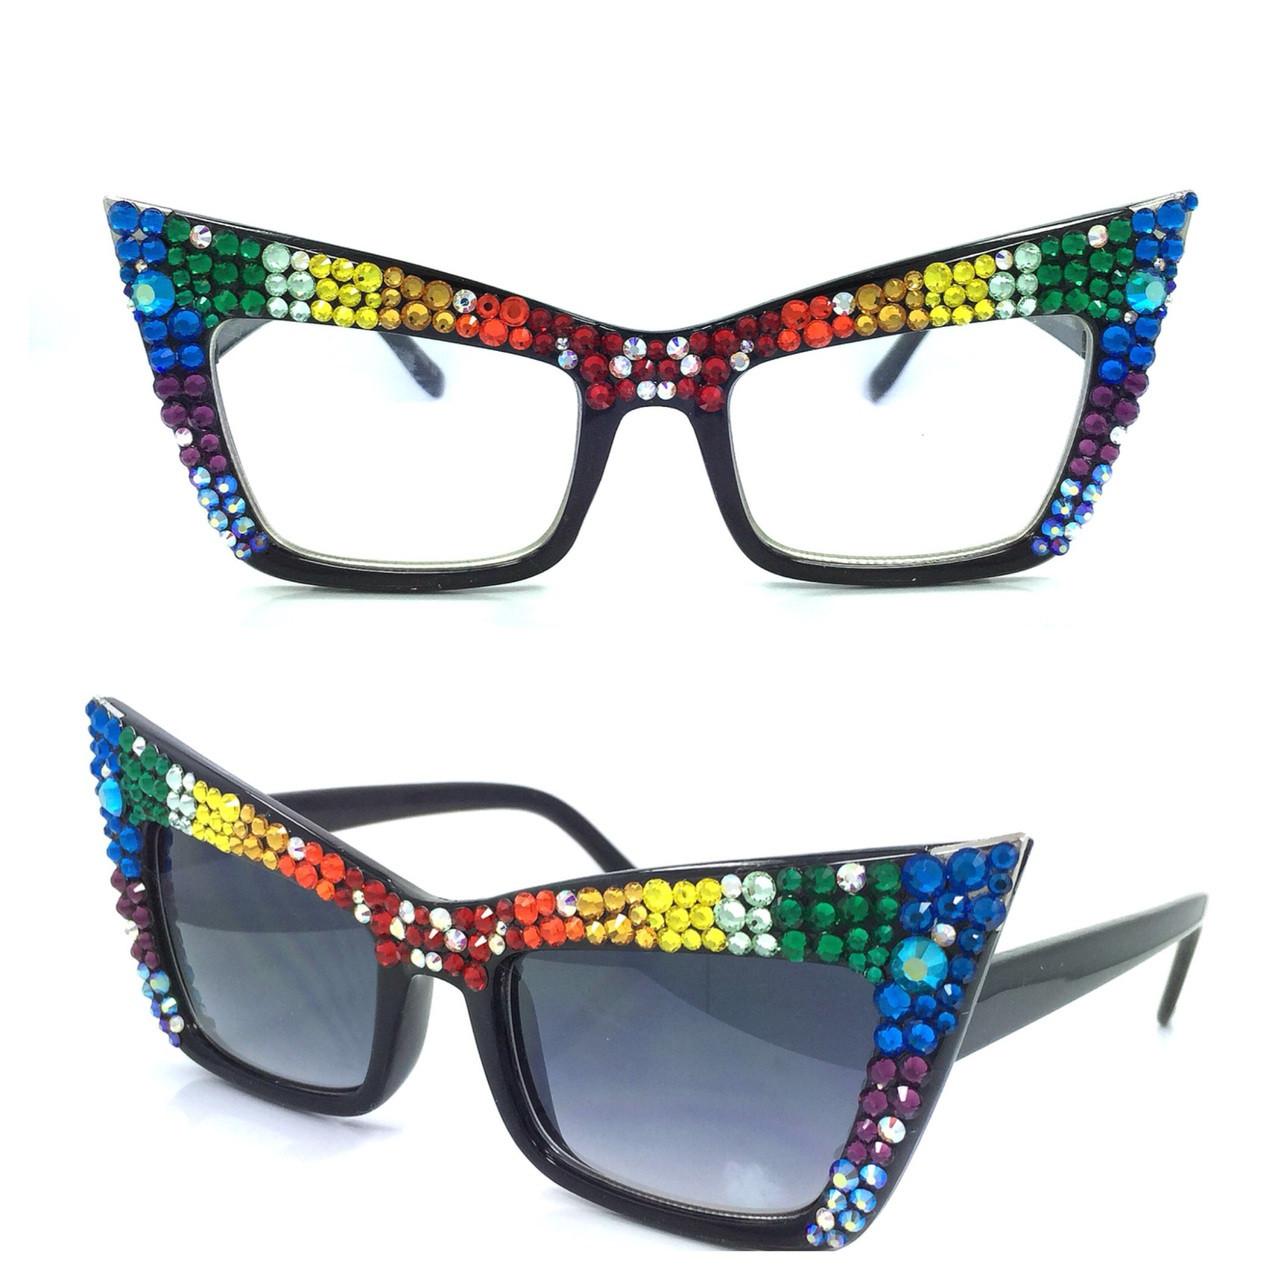 ac5923b6689 Crystal Square Cateye Reading Glasses